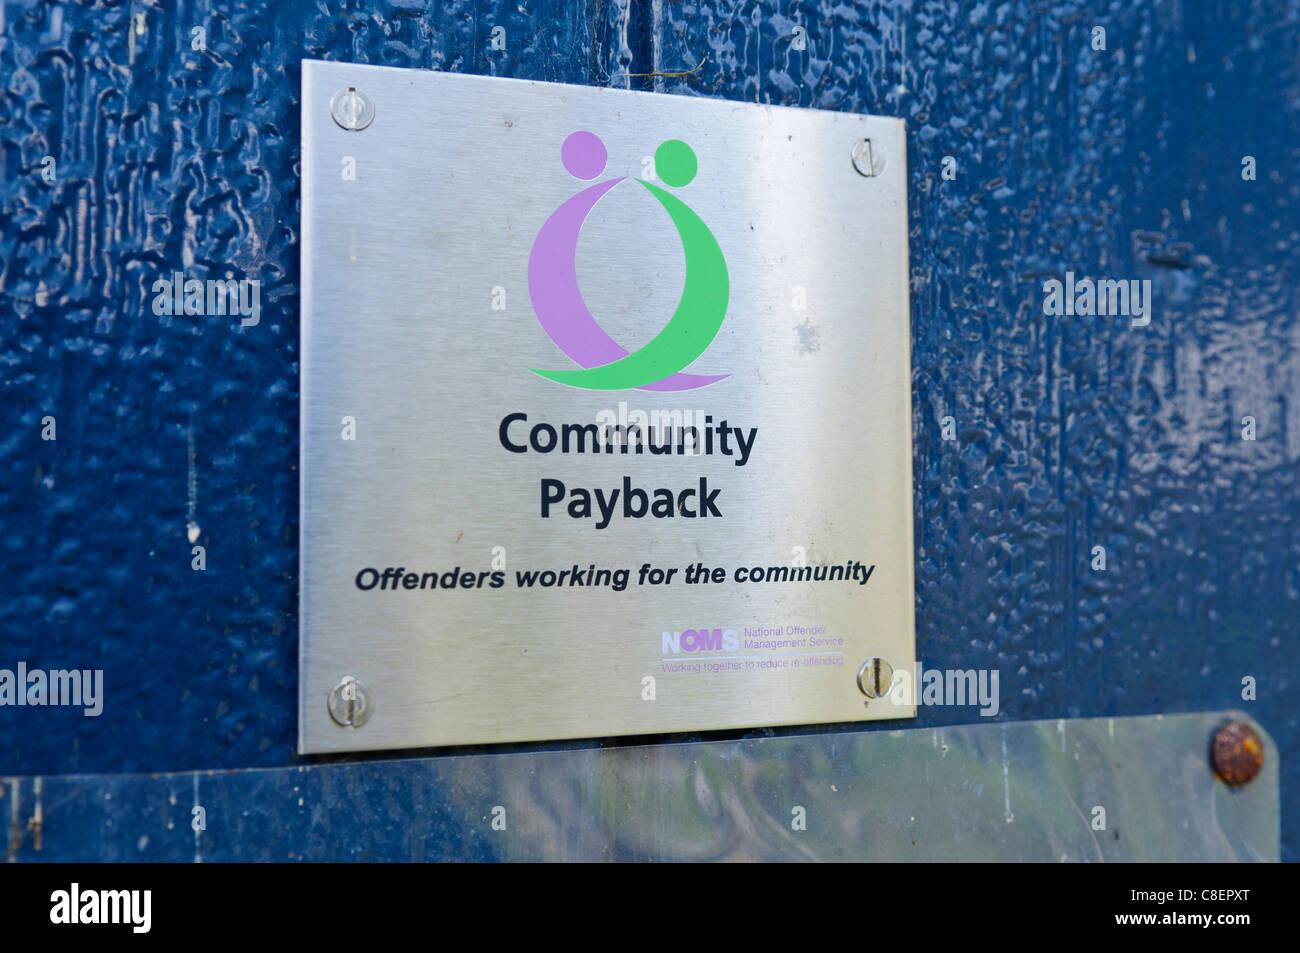 Community Payback sign - Stock Image